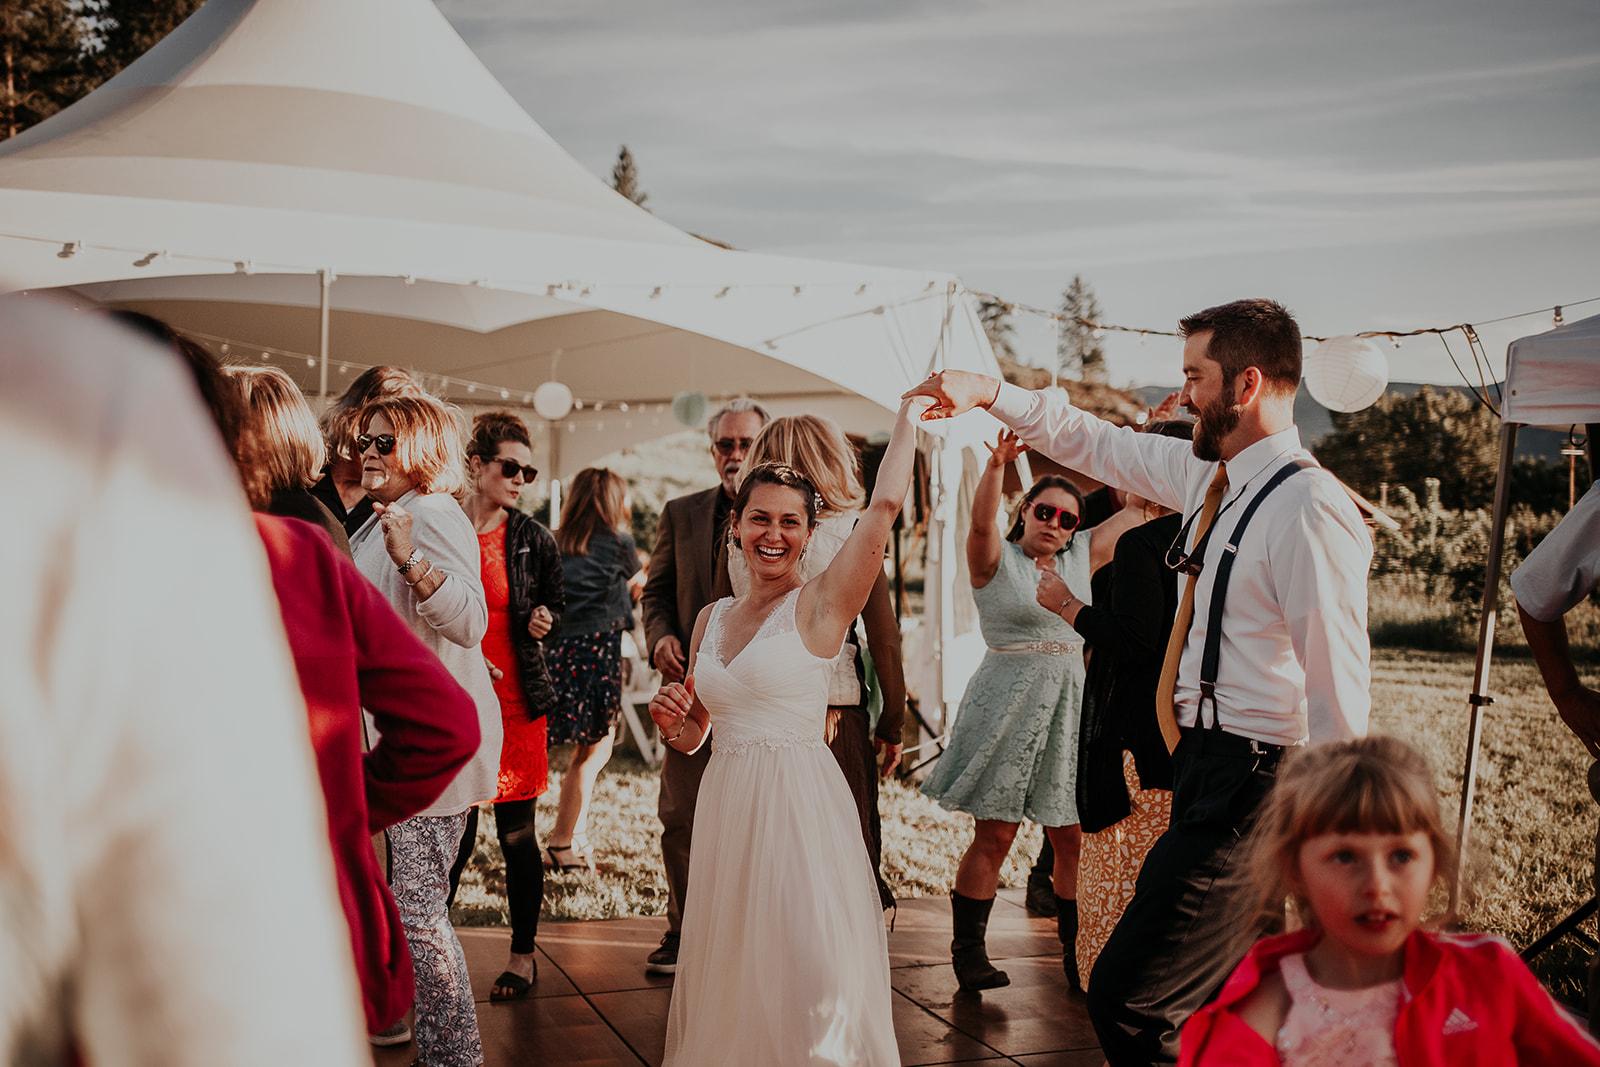 north-cascades-elopement-wedding-winthrop-wedding-photographer-megan-gallagher-photography (29).jpg